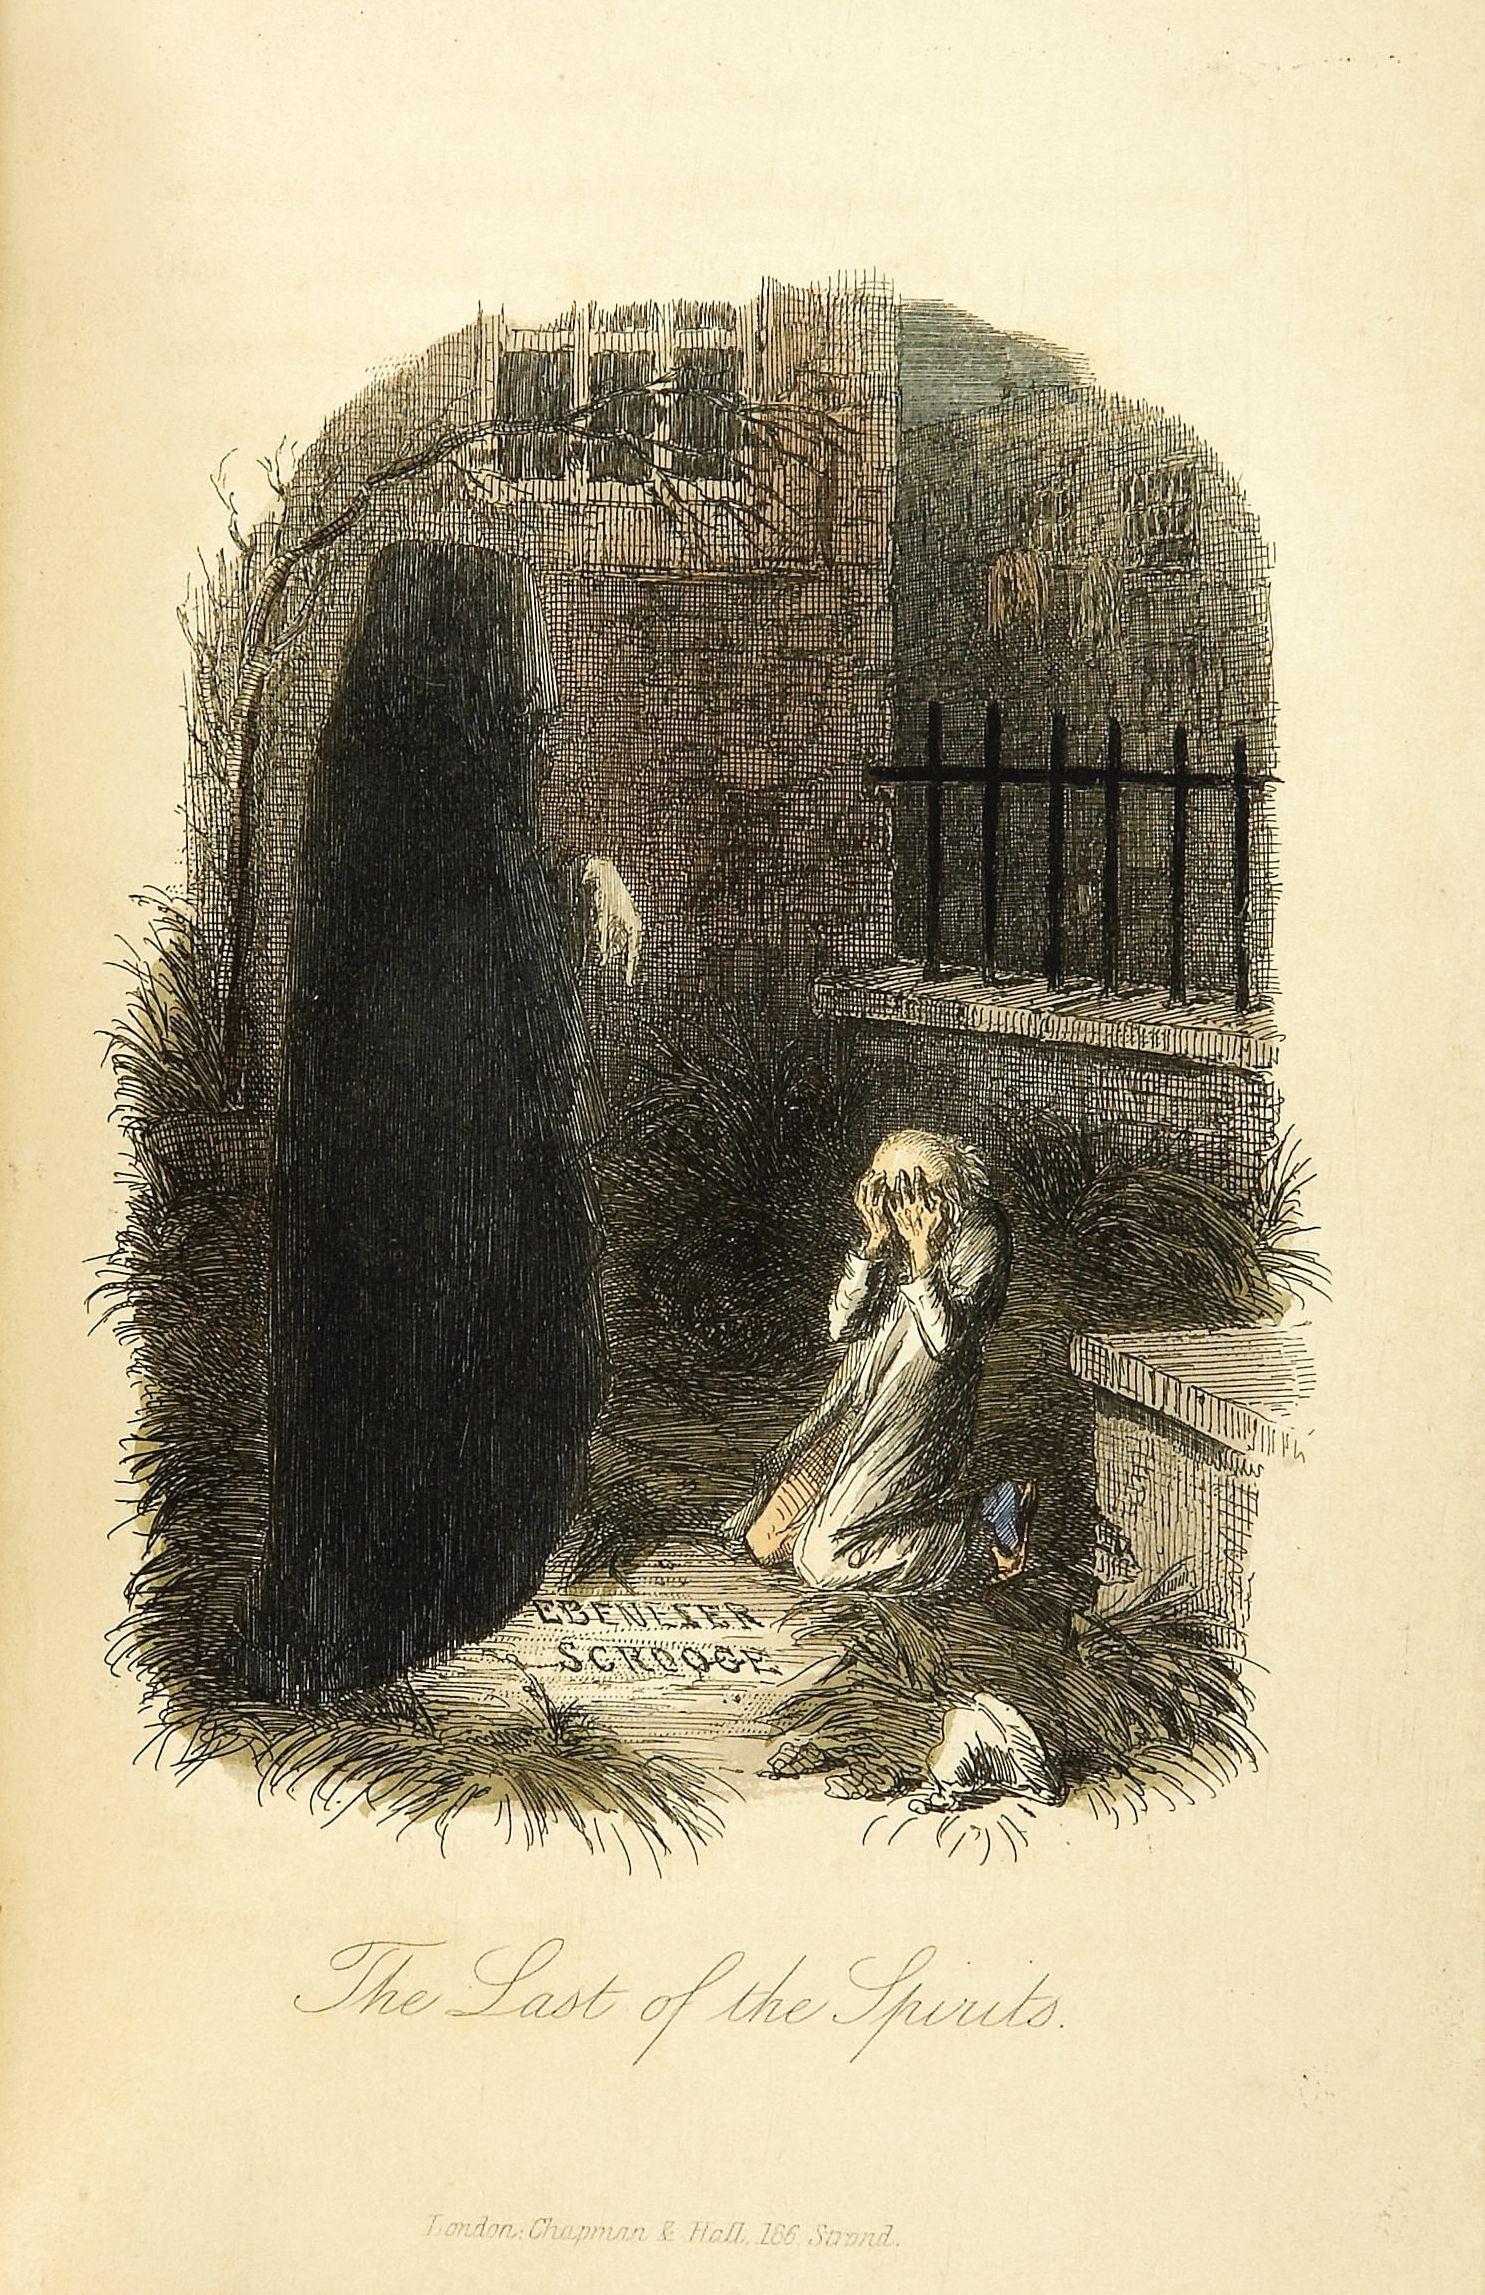 http://en.wikipedia.org/wiki/Image:The_Last_of_the_Spirits-John_Leech,_1843.jpg